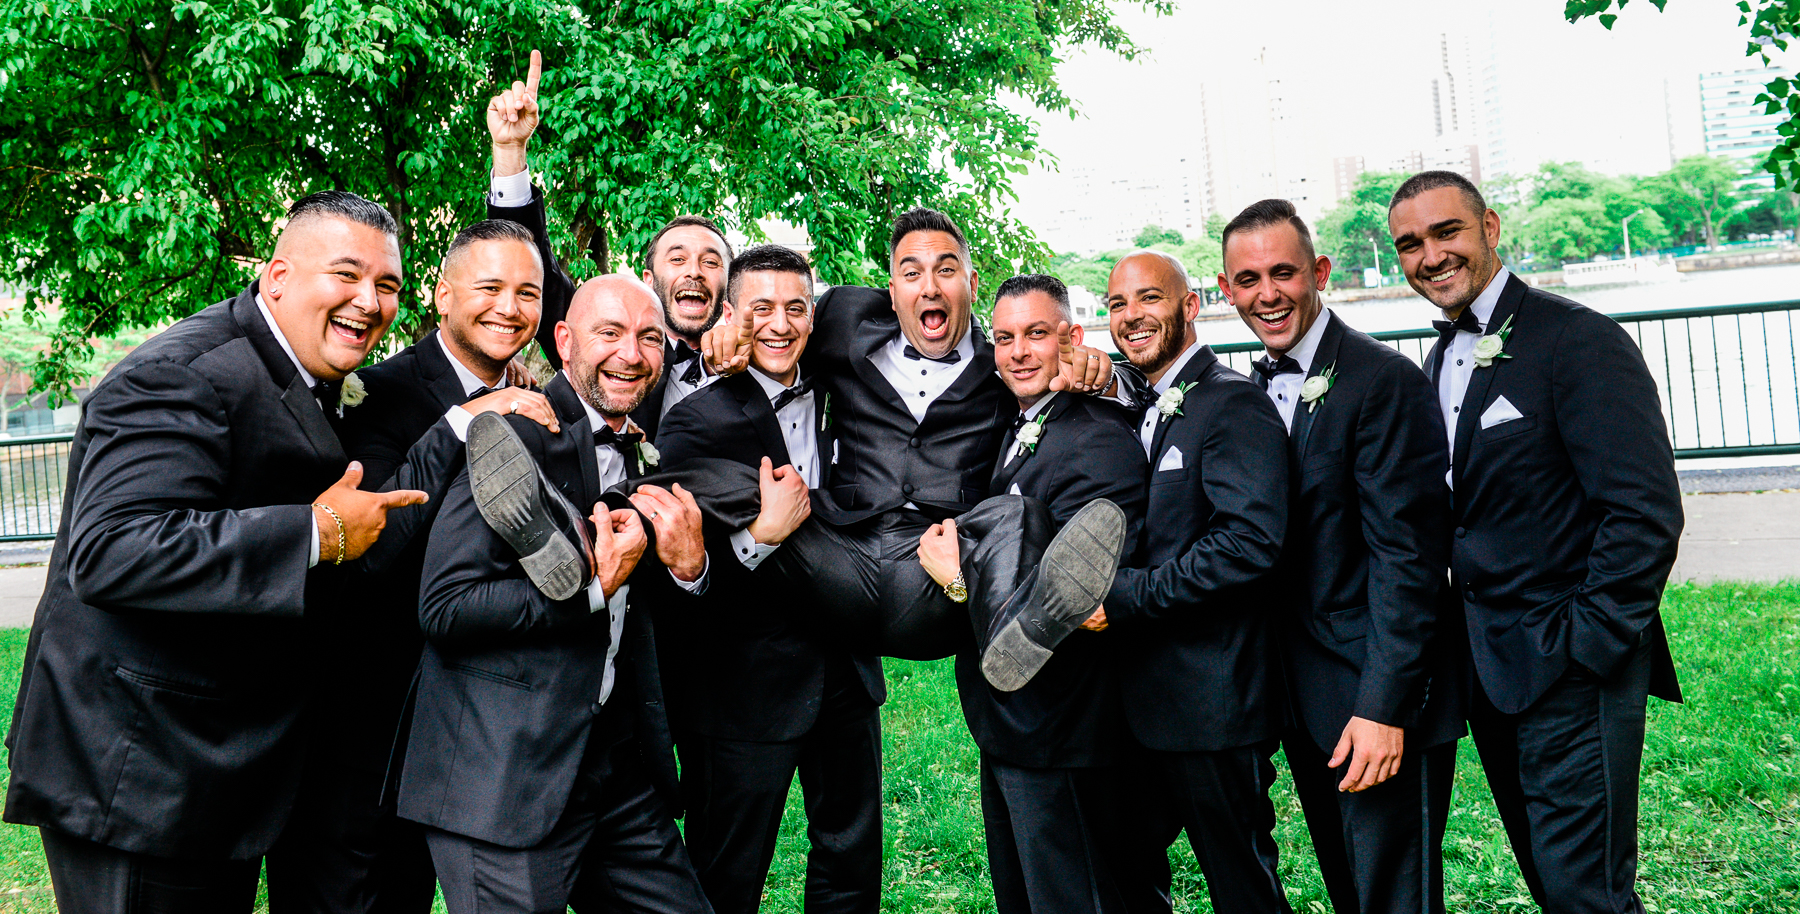 Boston Wedding Photographer Christian Pleva-69.jpg